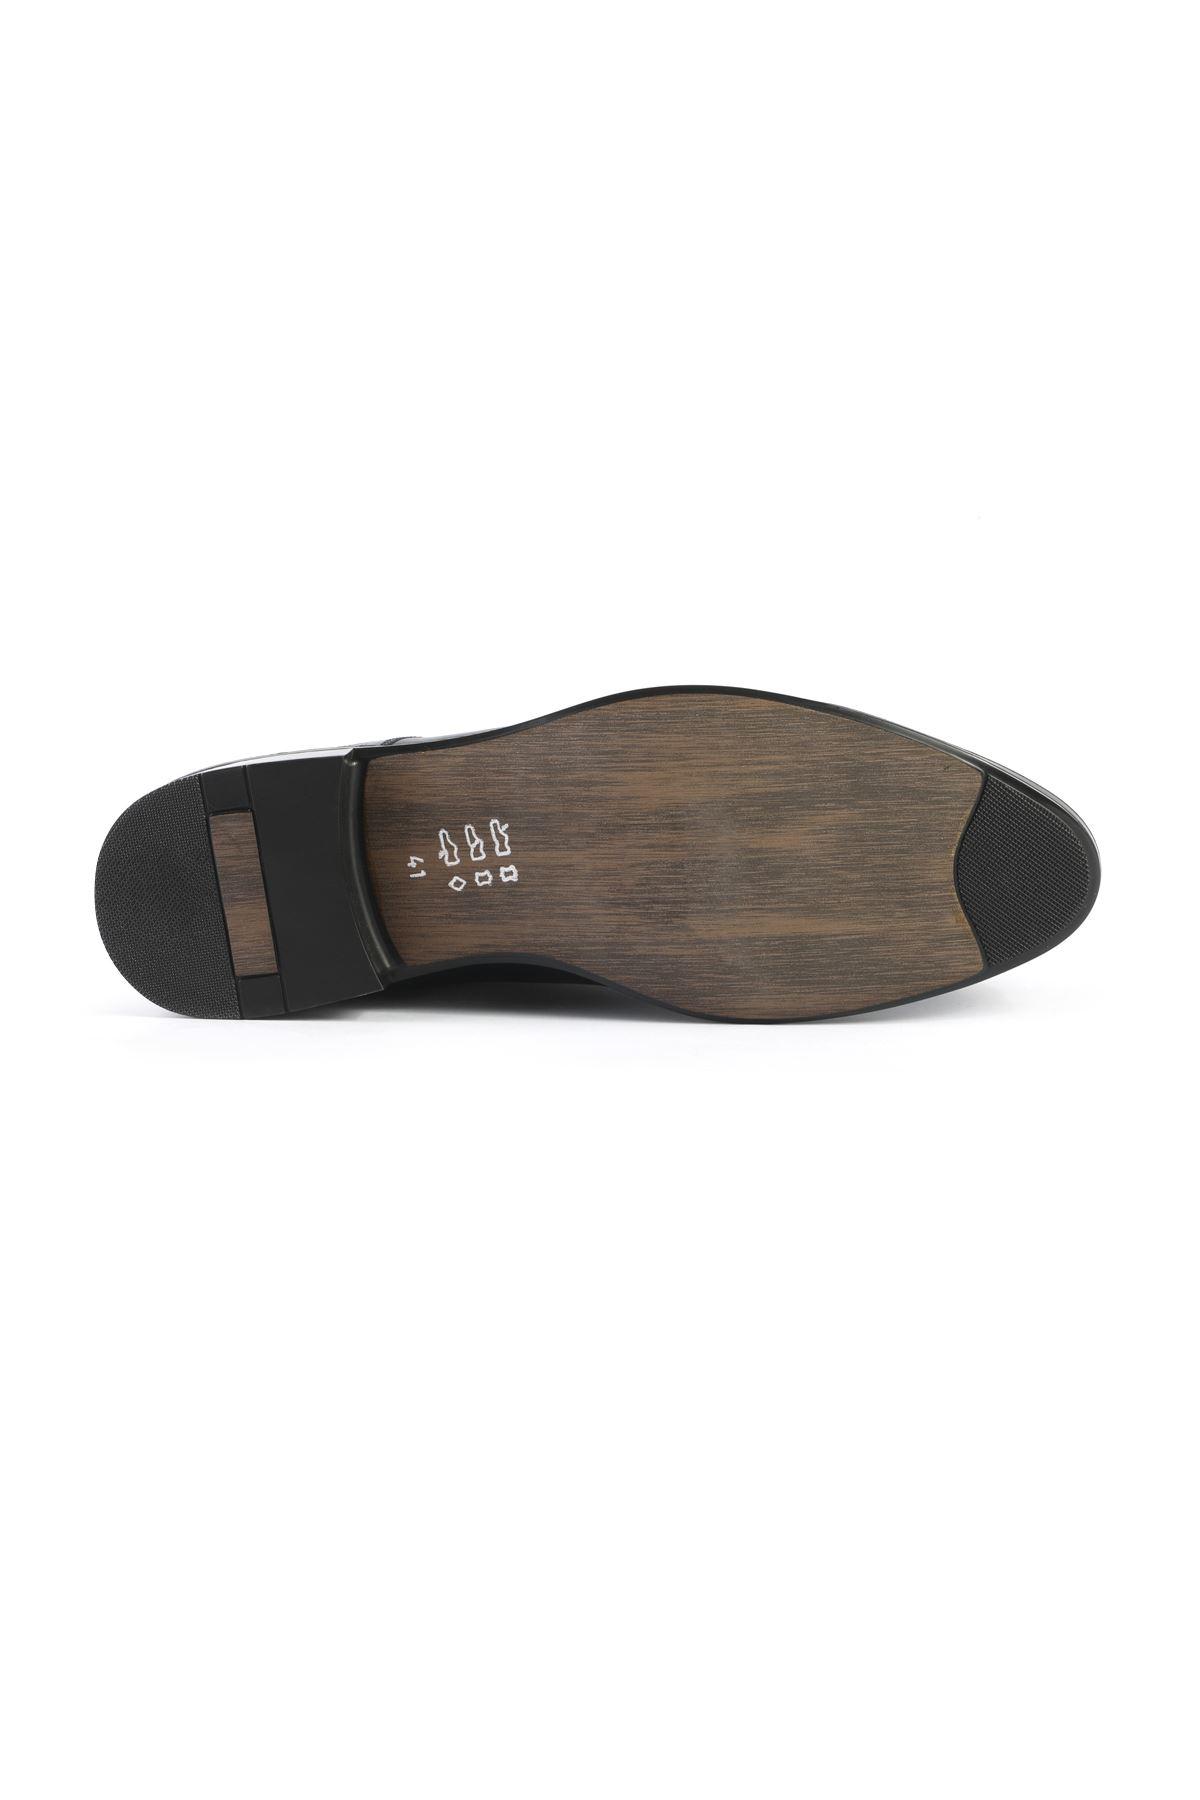 Libero T1189 Lacivert Klasik Ayakkabı